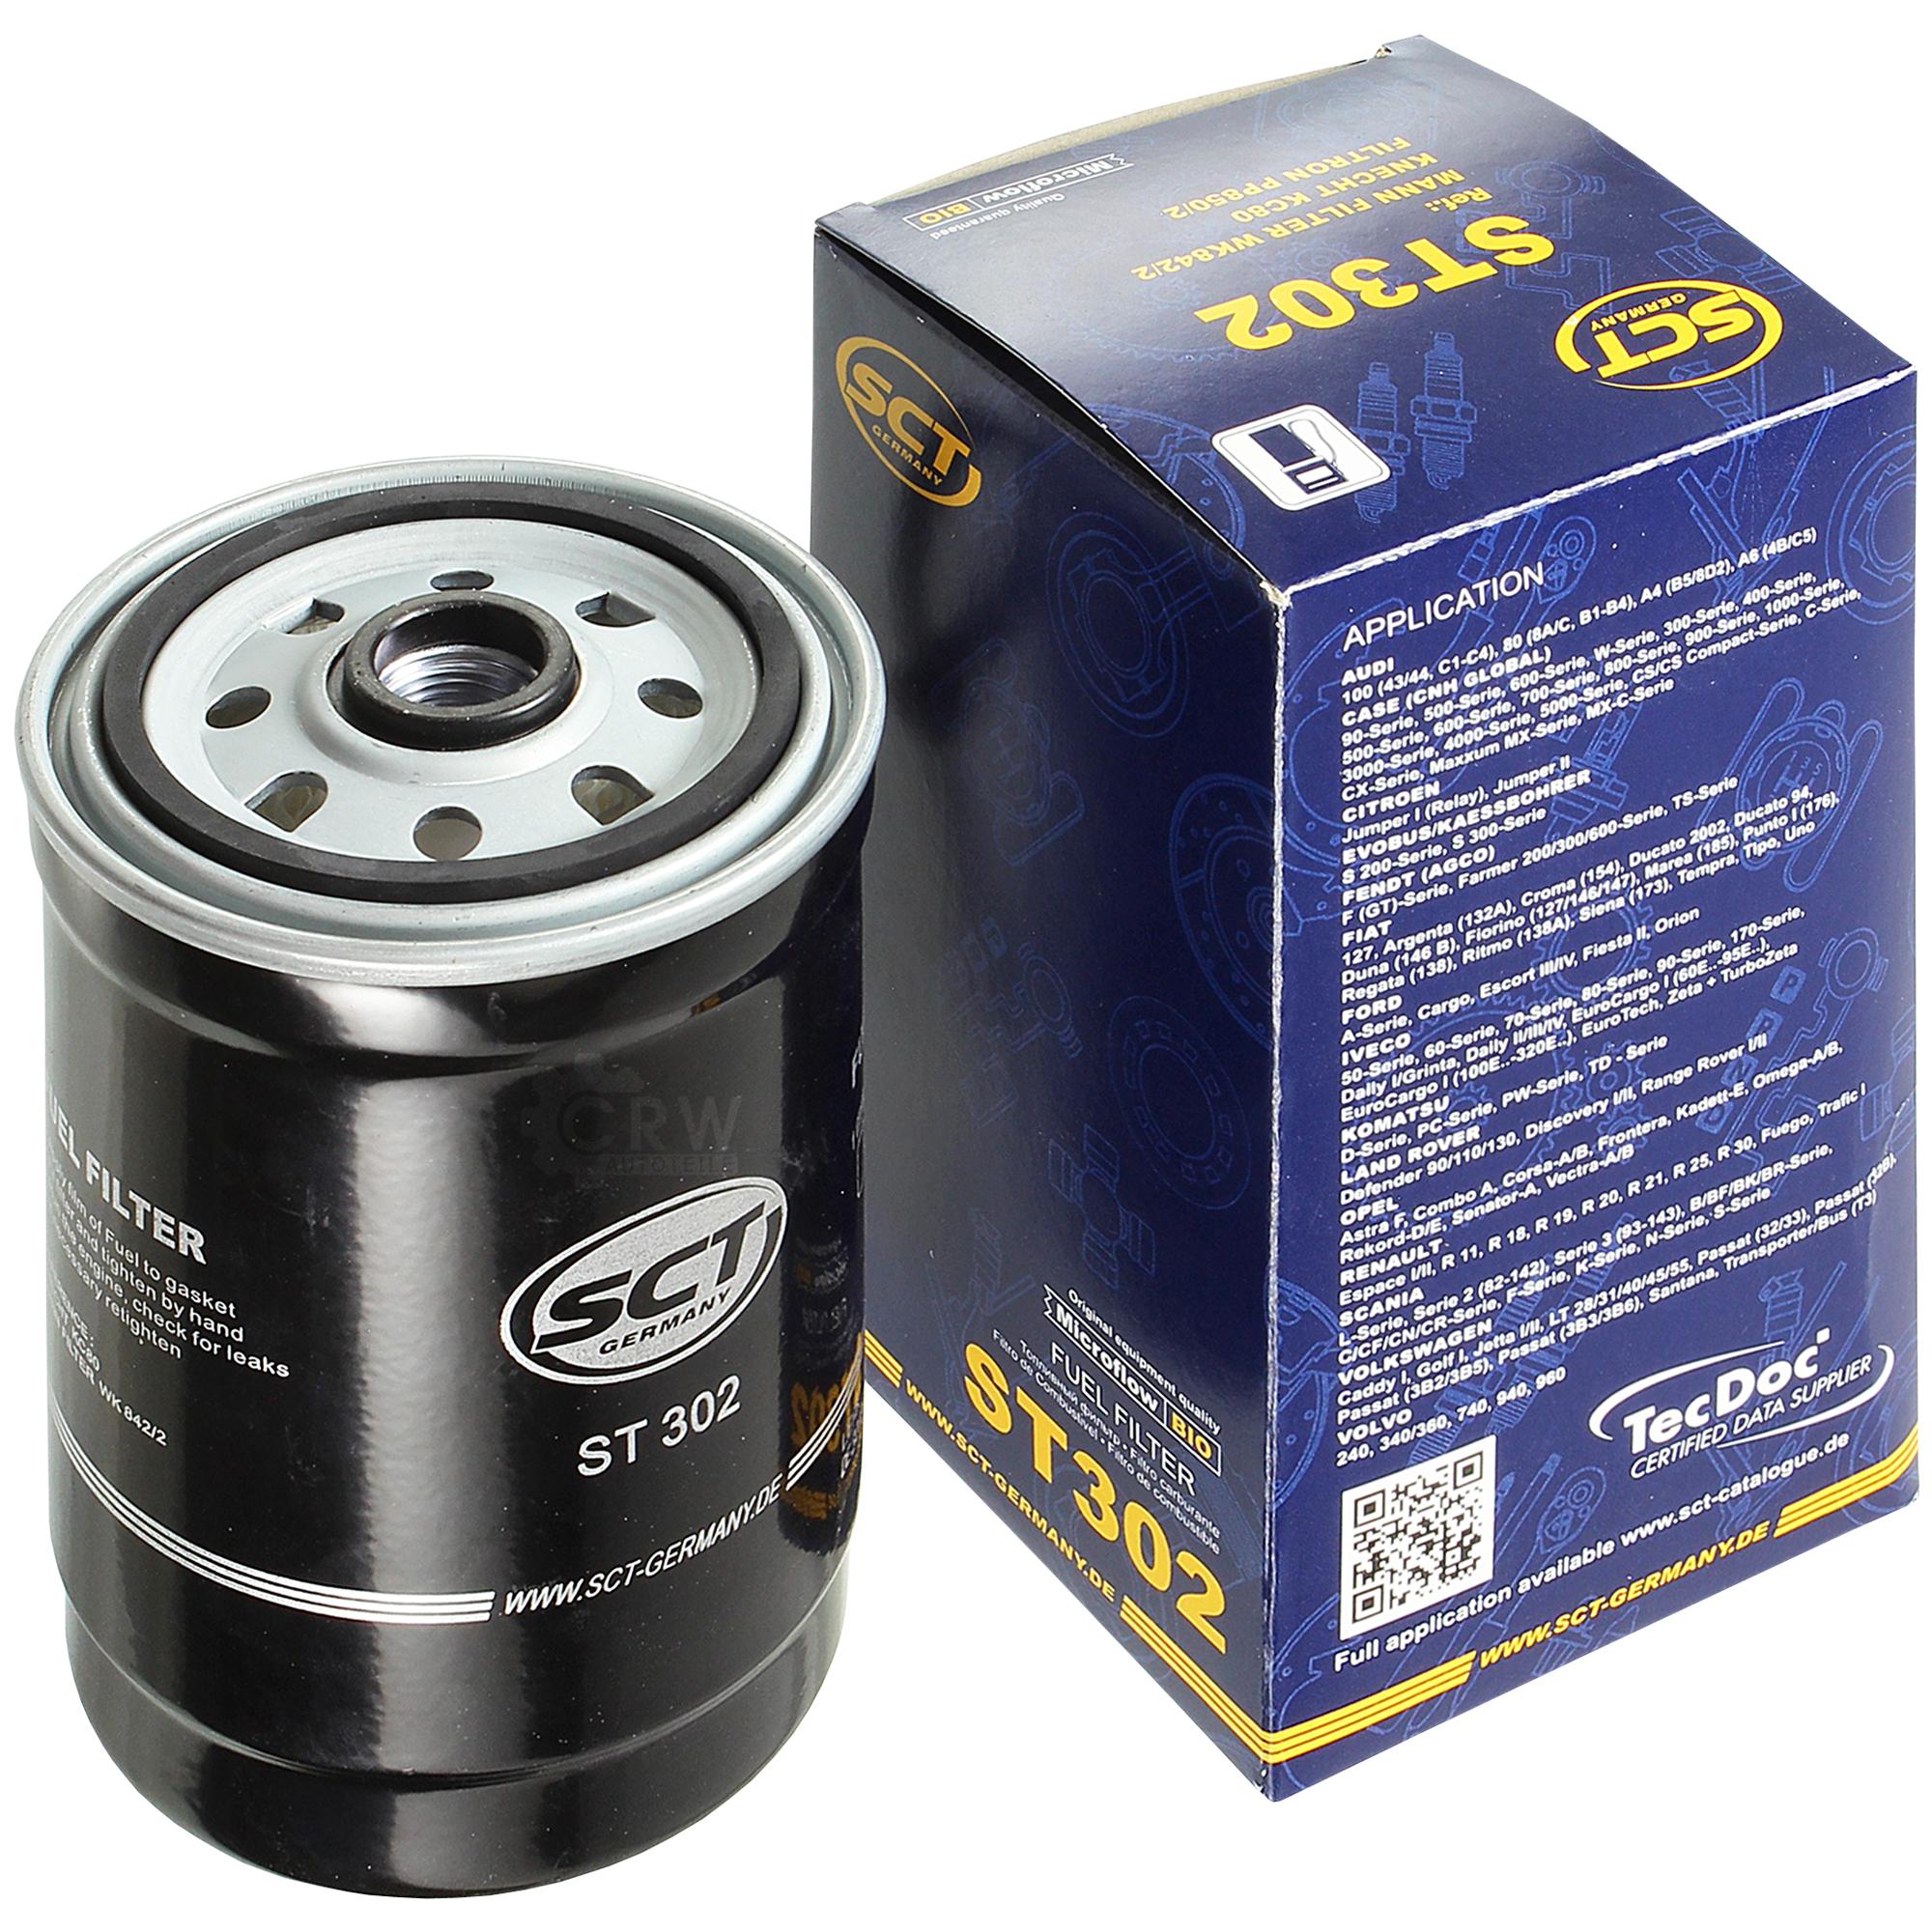 Olwechsel-Set-5L-MANNOL-Classic-10W-40-Motoroel-SCT-Filter-KIT-10133991